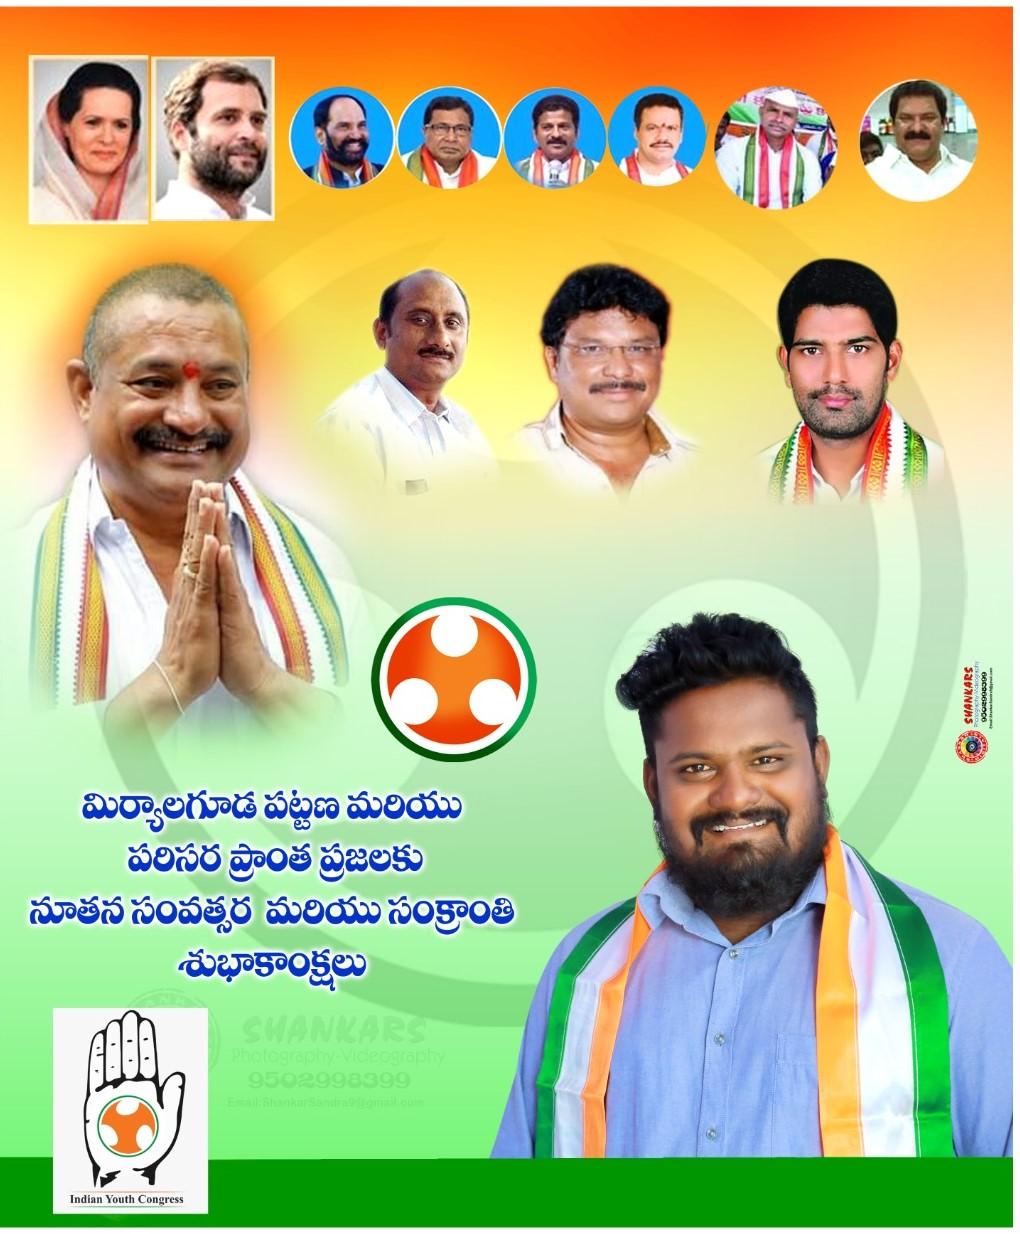 Kodati Anil | Youth Congress Leader | Congress | SFI | Division General Secretary | Social Activist | Miryalaguda | Nalgonda | Telangana | theLeadersPage